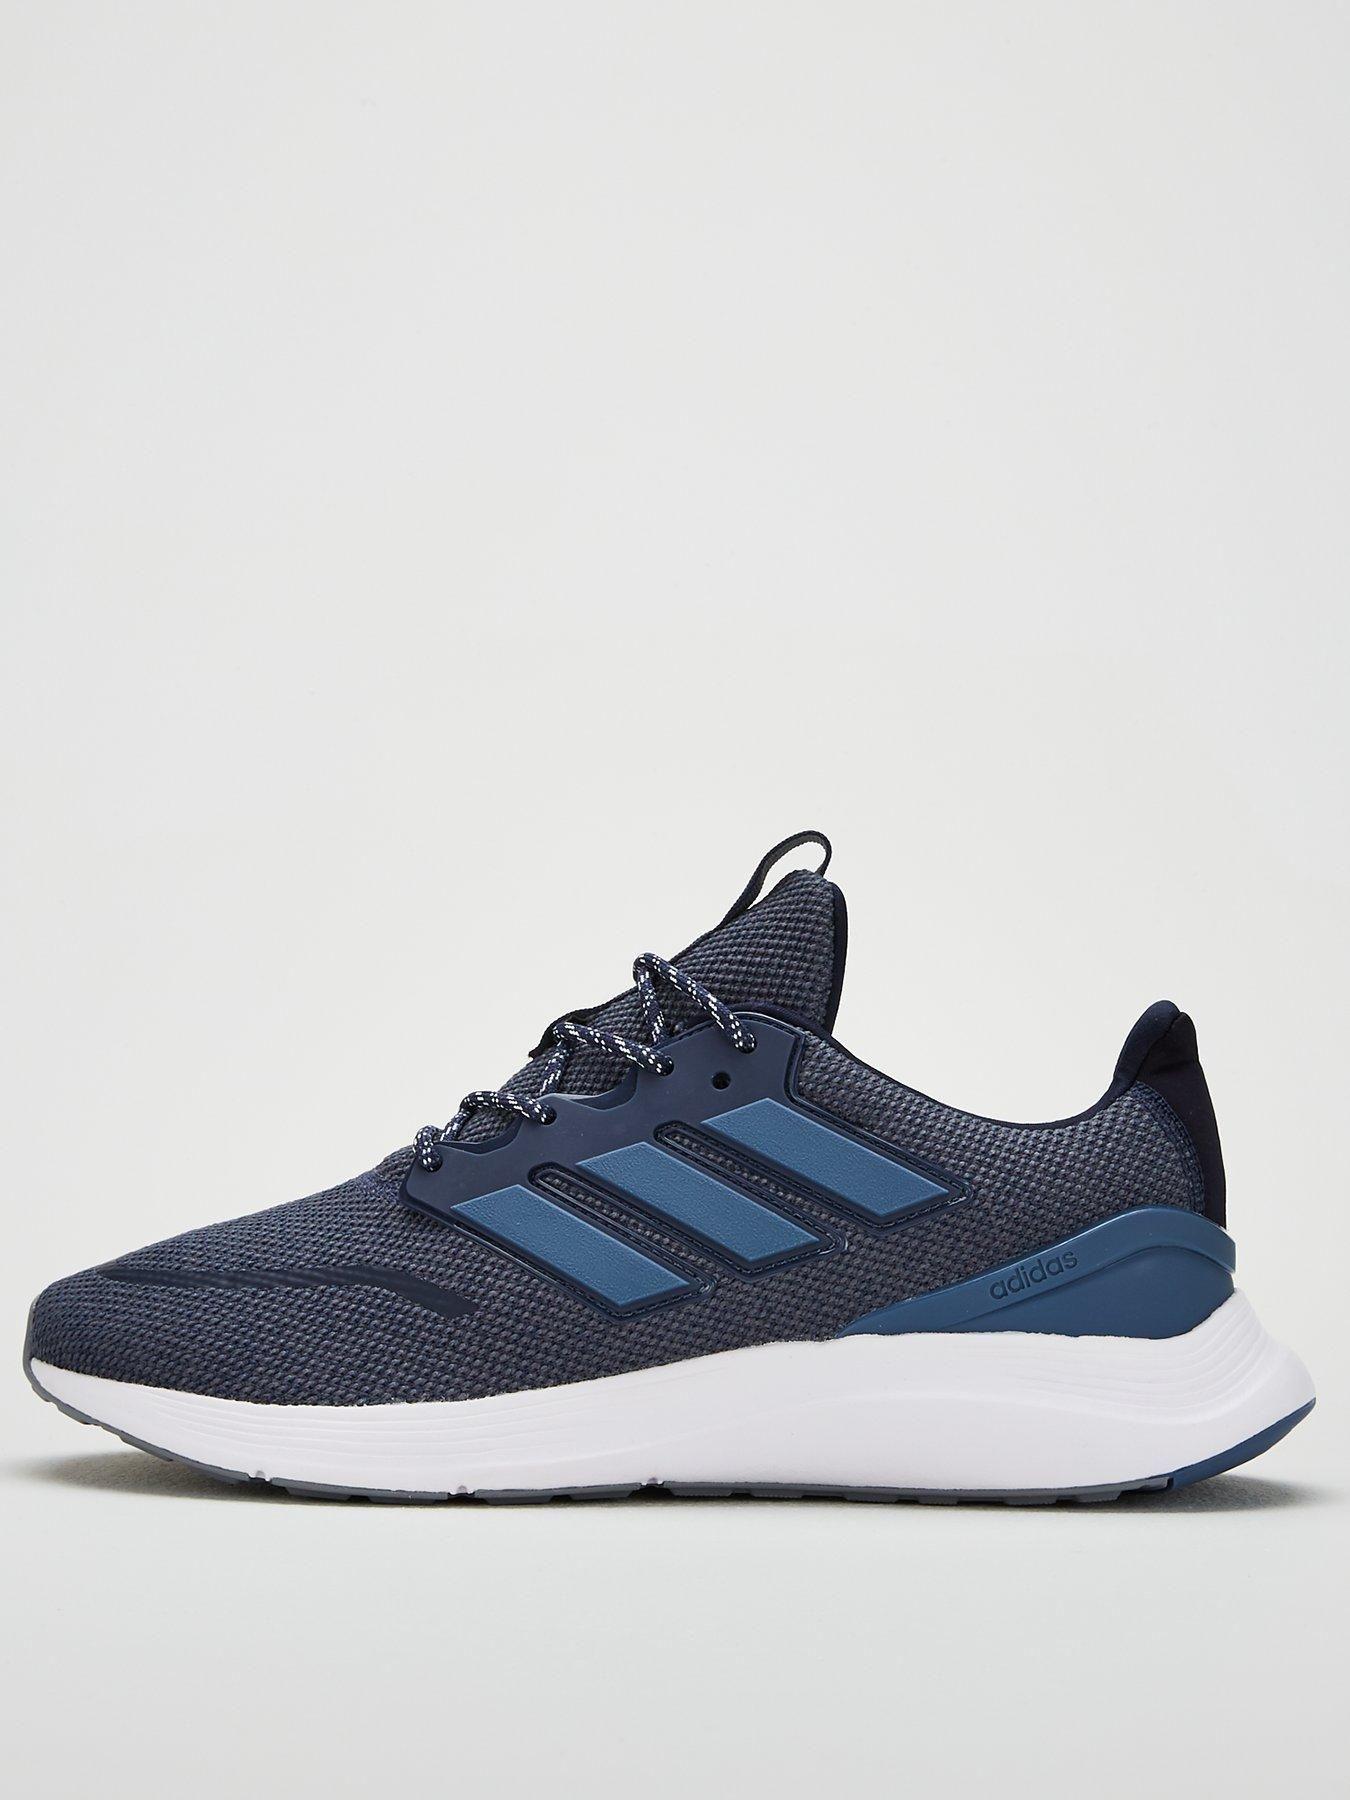 Adidas Energy Falcon - Blue/White, Blue